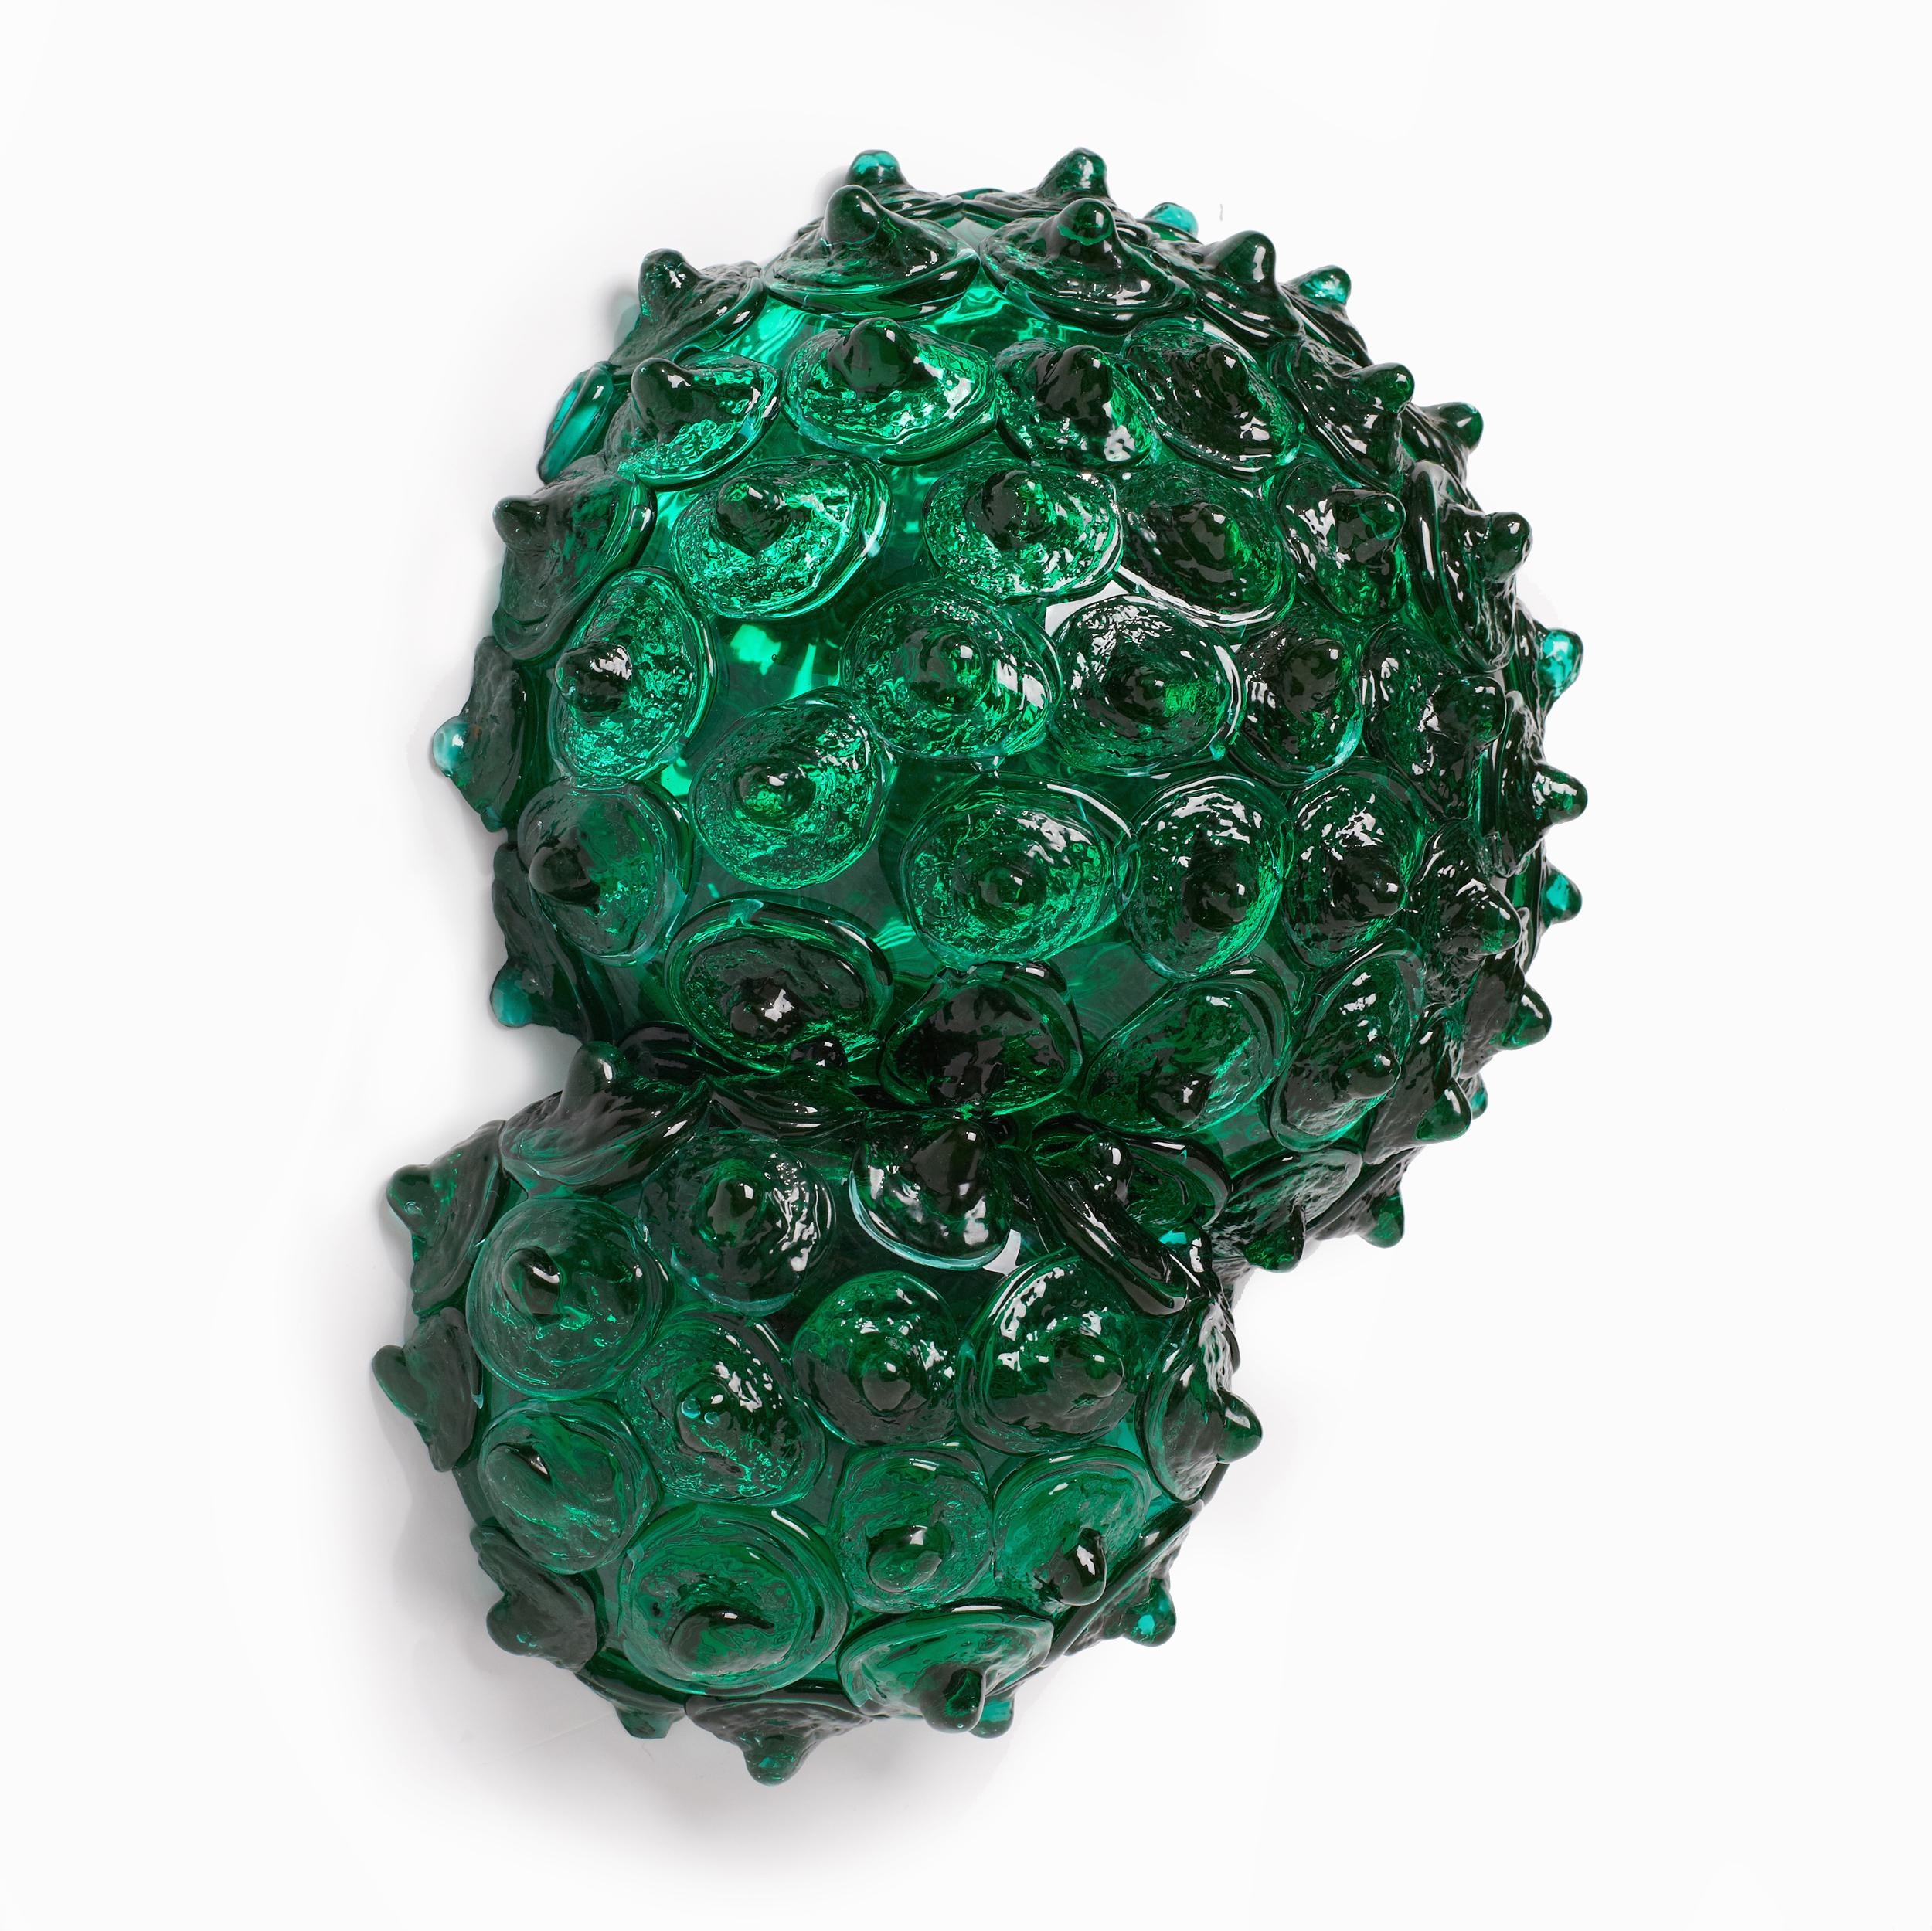 Green double bubble no. 2, Katherine Rutecki, 2016